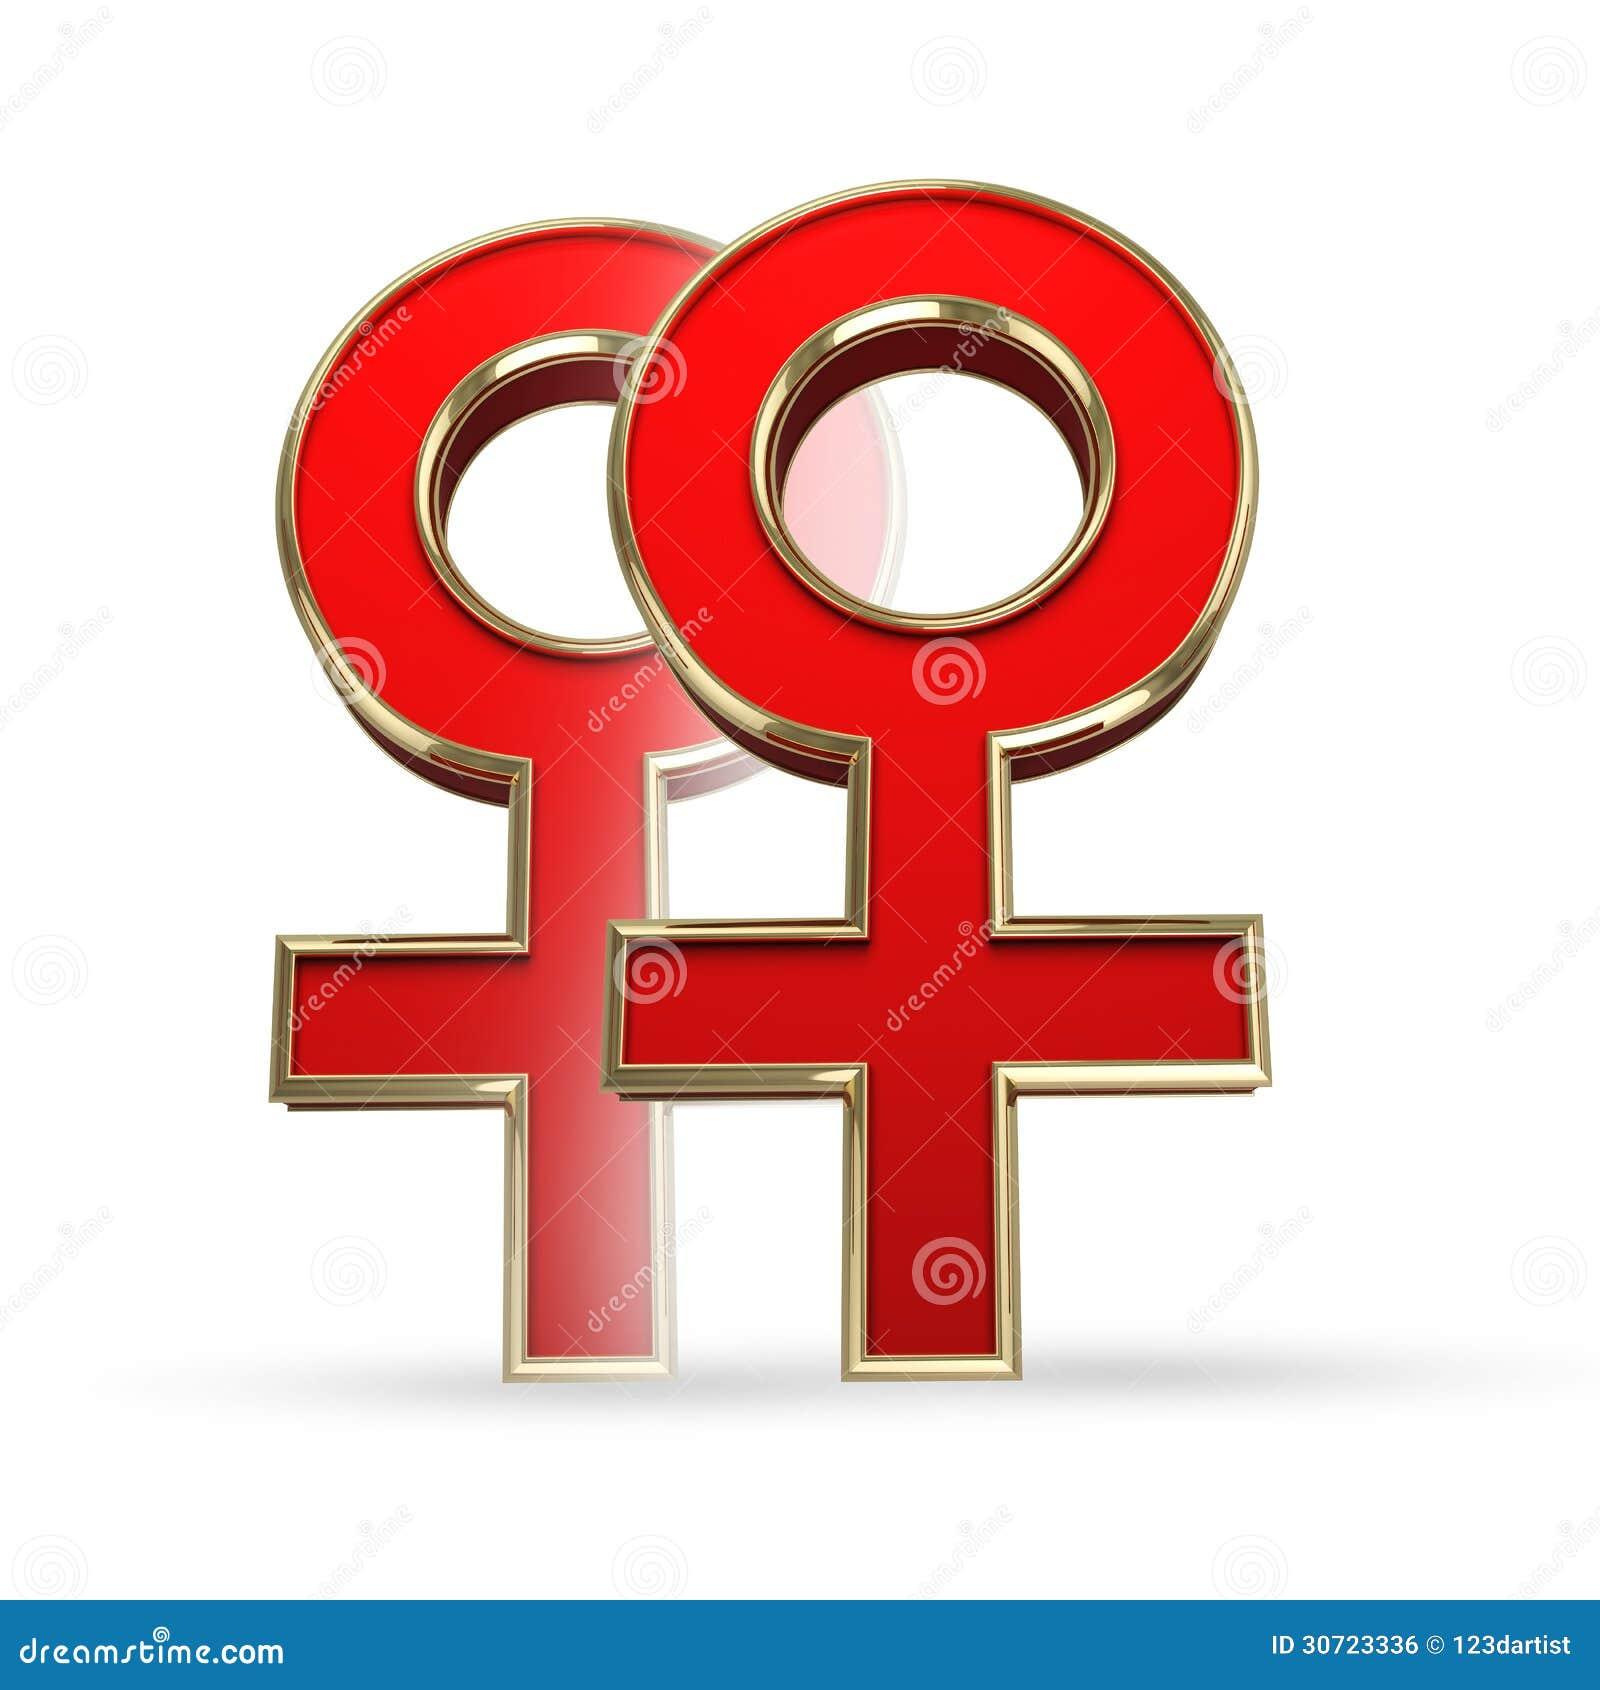 videos de sexo grupal videos de lesbicas gratis